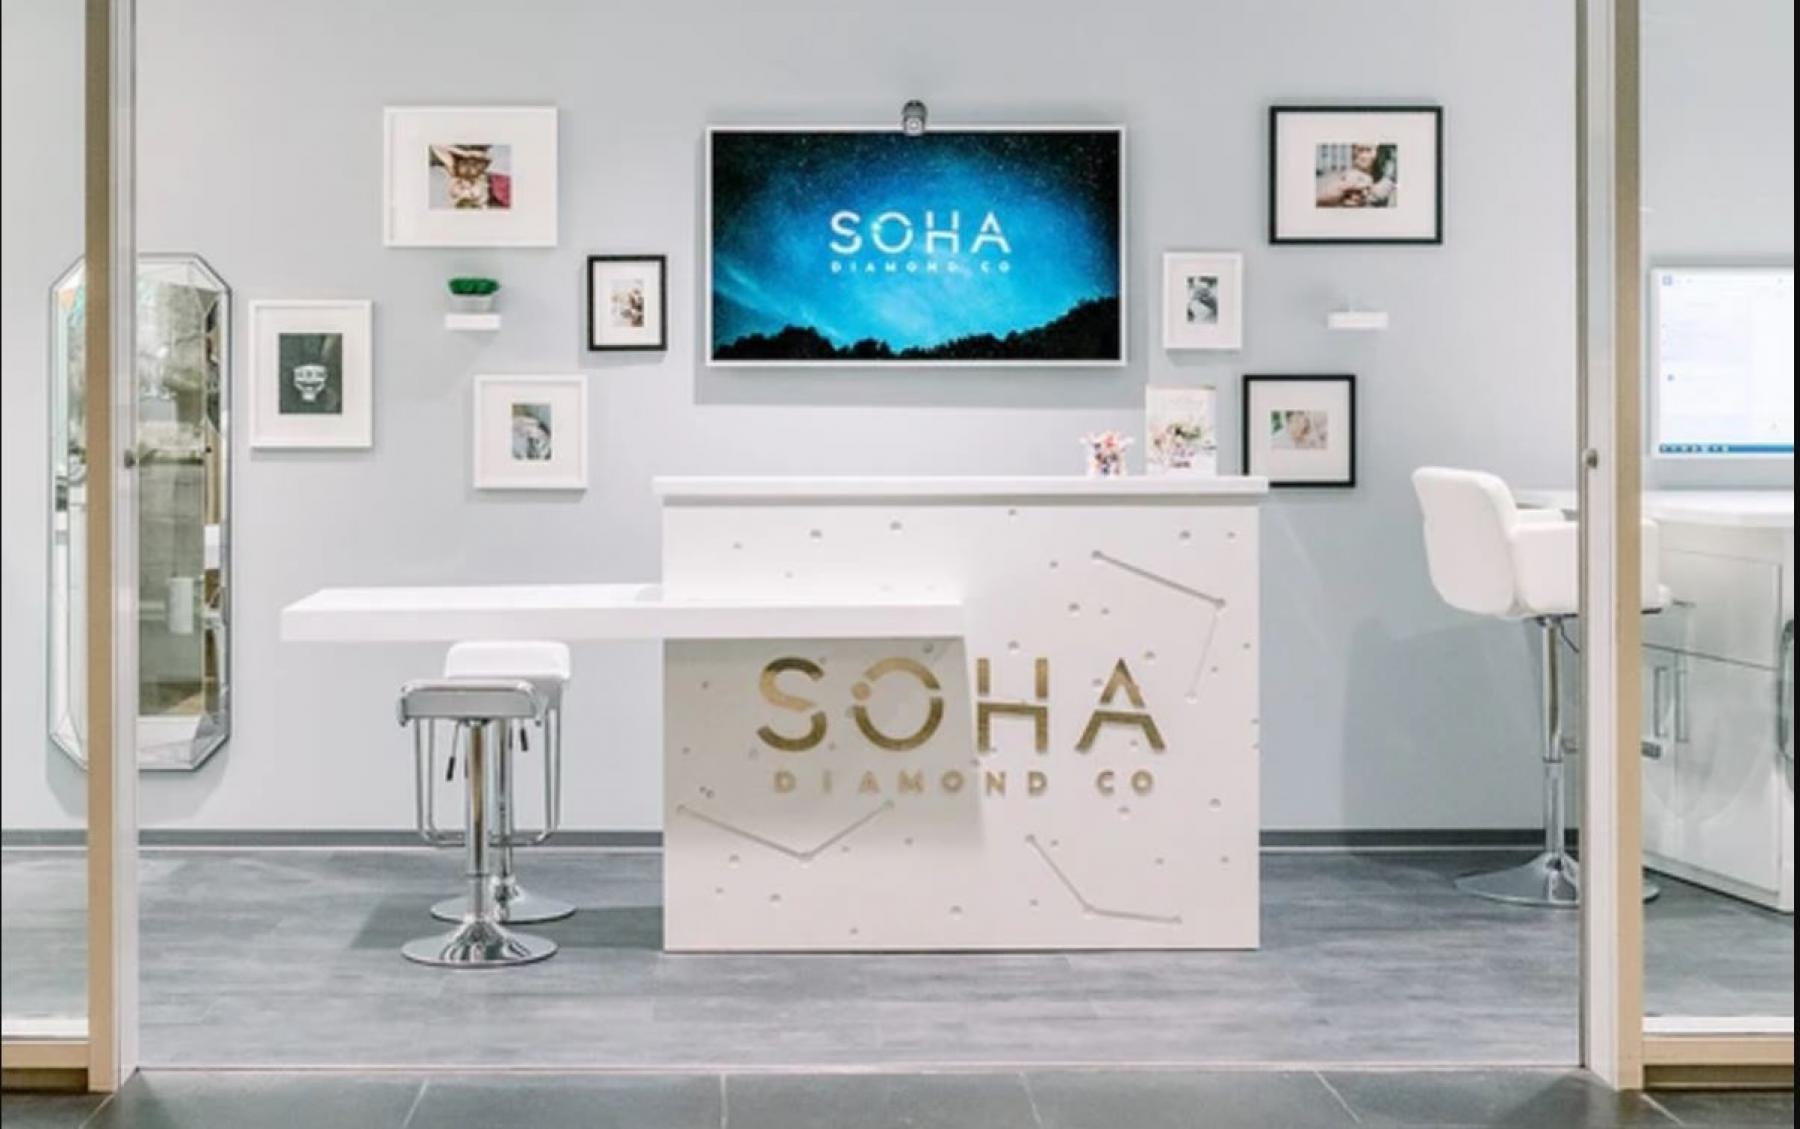 Soha Diamond Company - Custom jeweler located in the US Bank Plaza